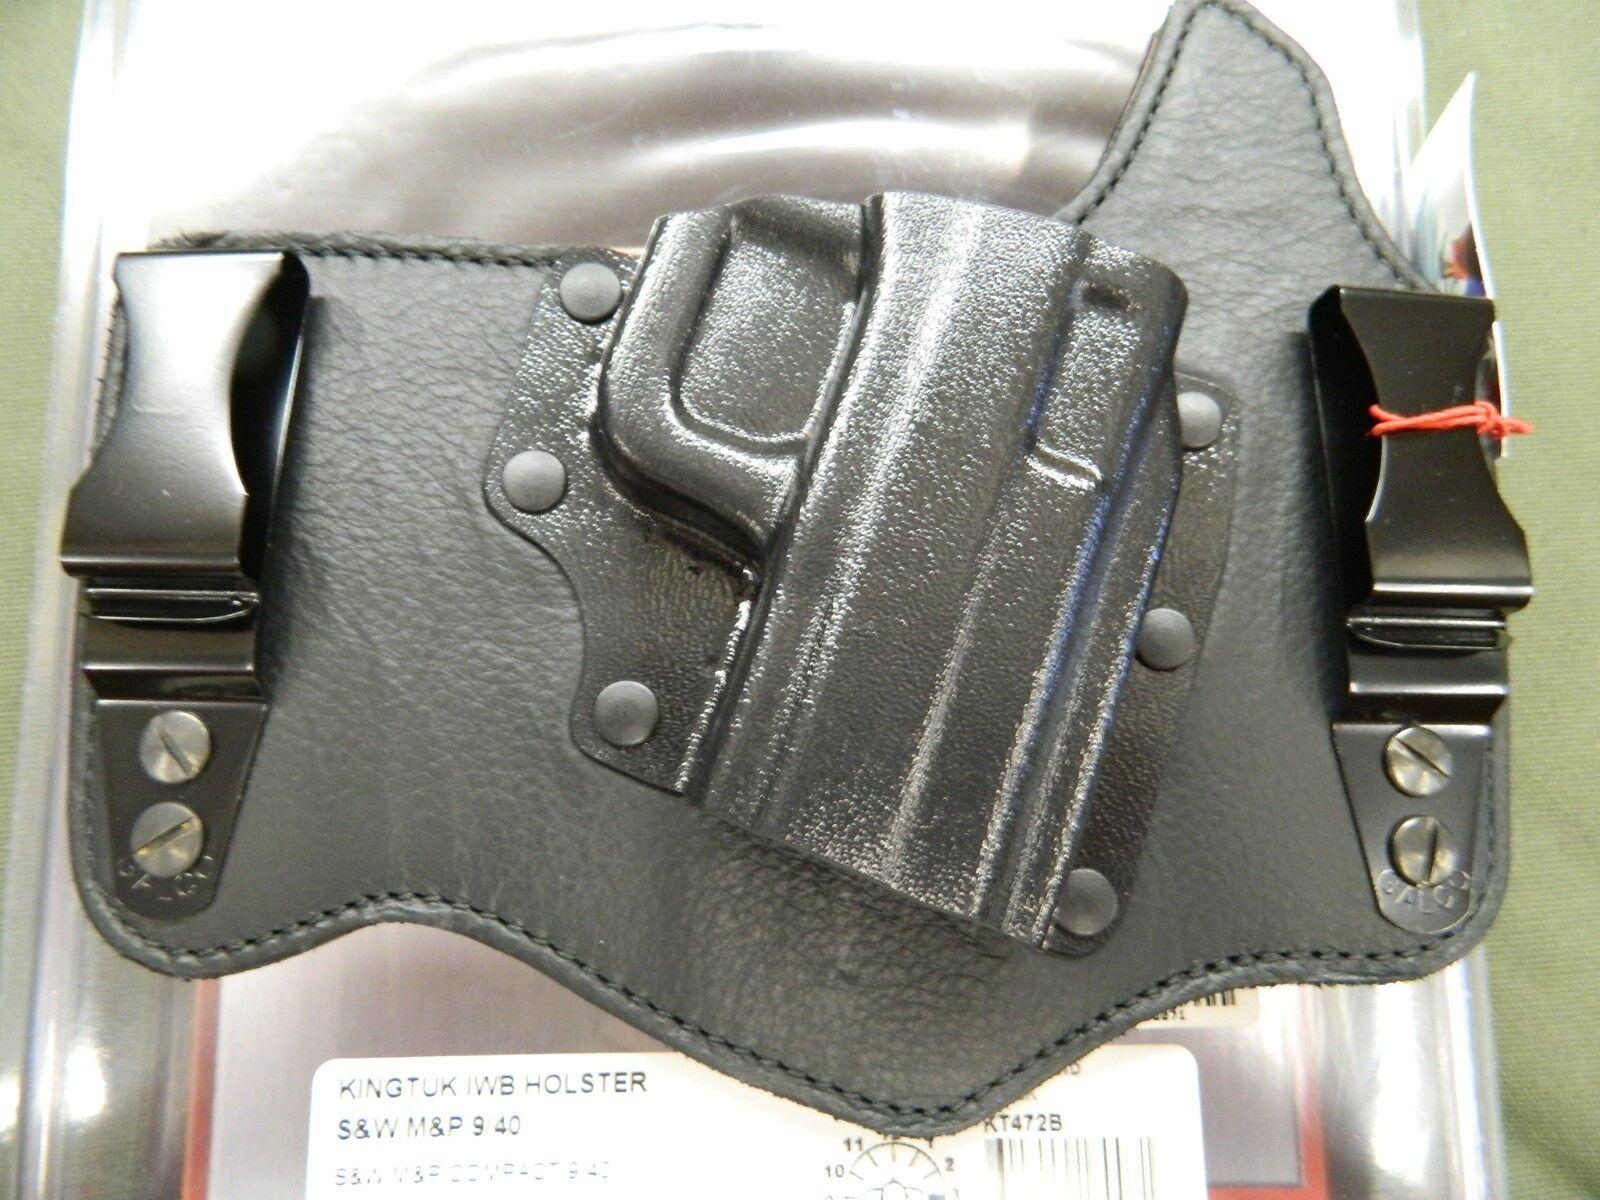 Galco kingtuk Exhibición Funda de Smith & Wesson M & P Compacto KT472B Negro RH